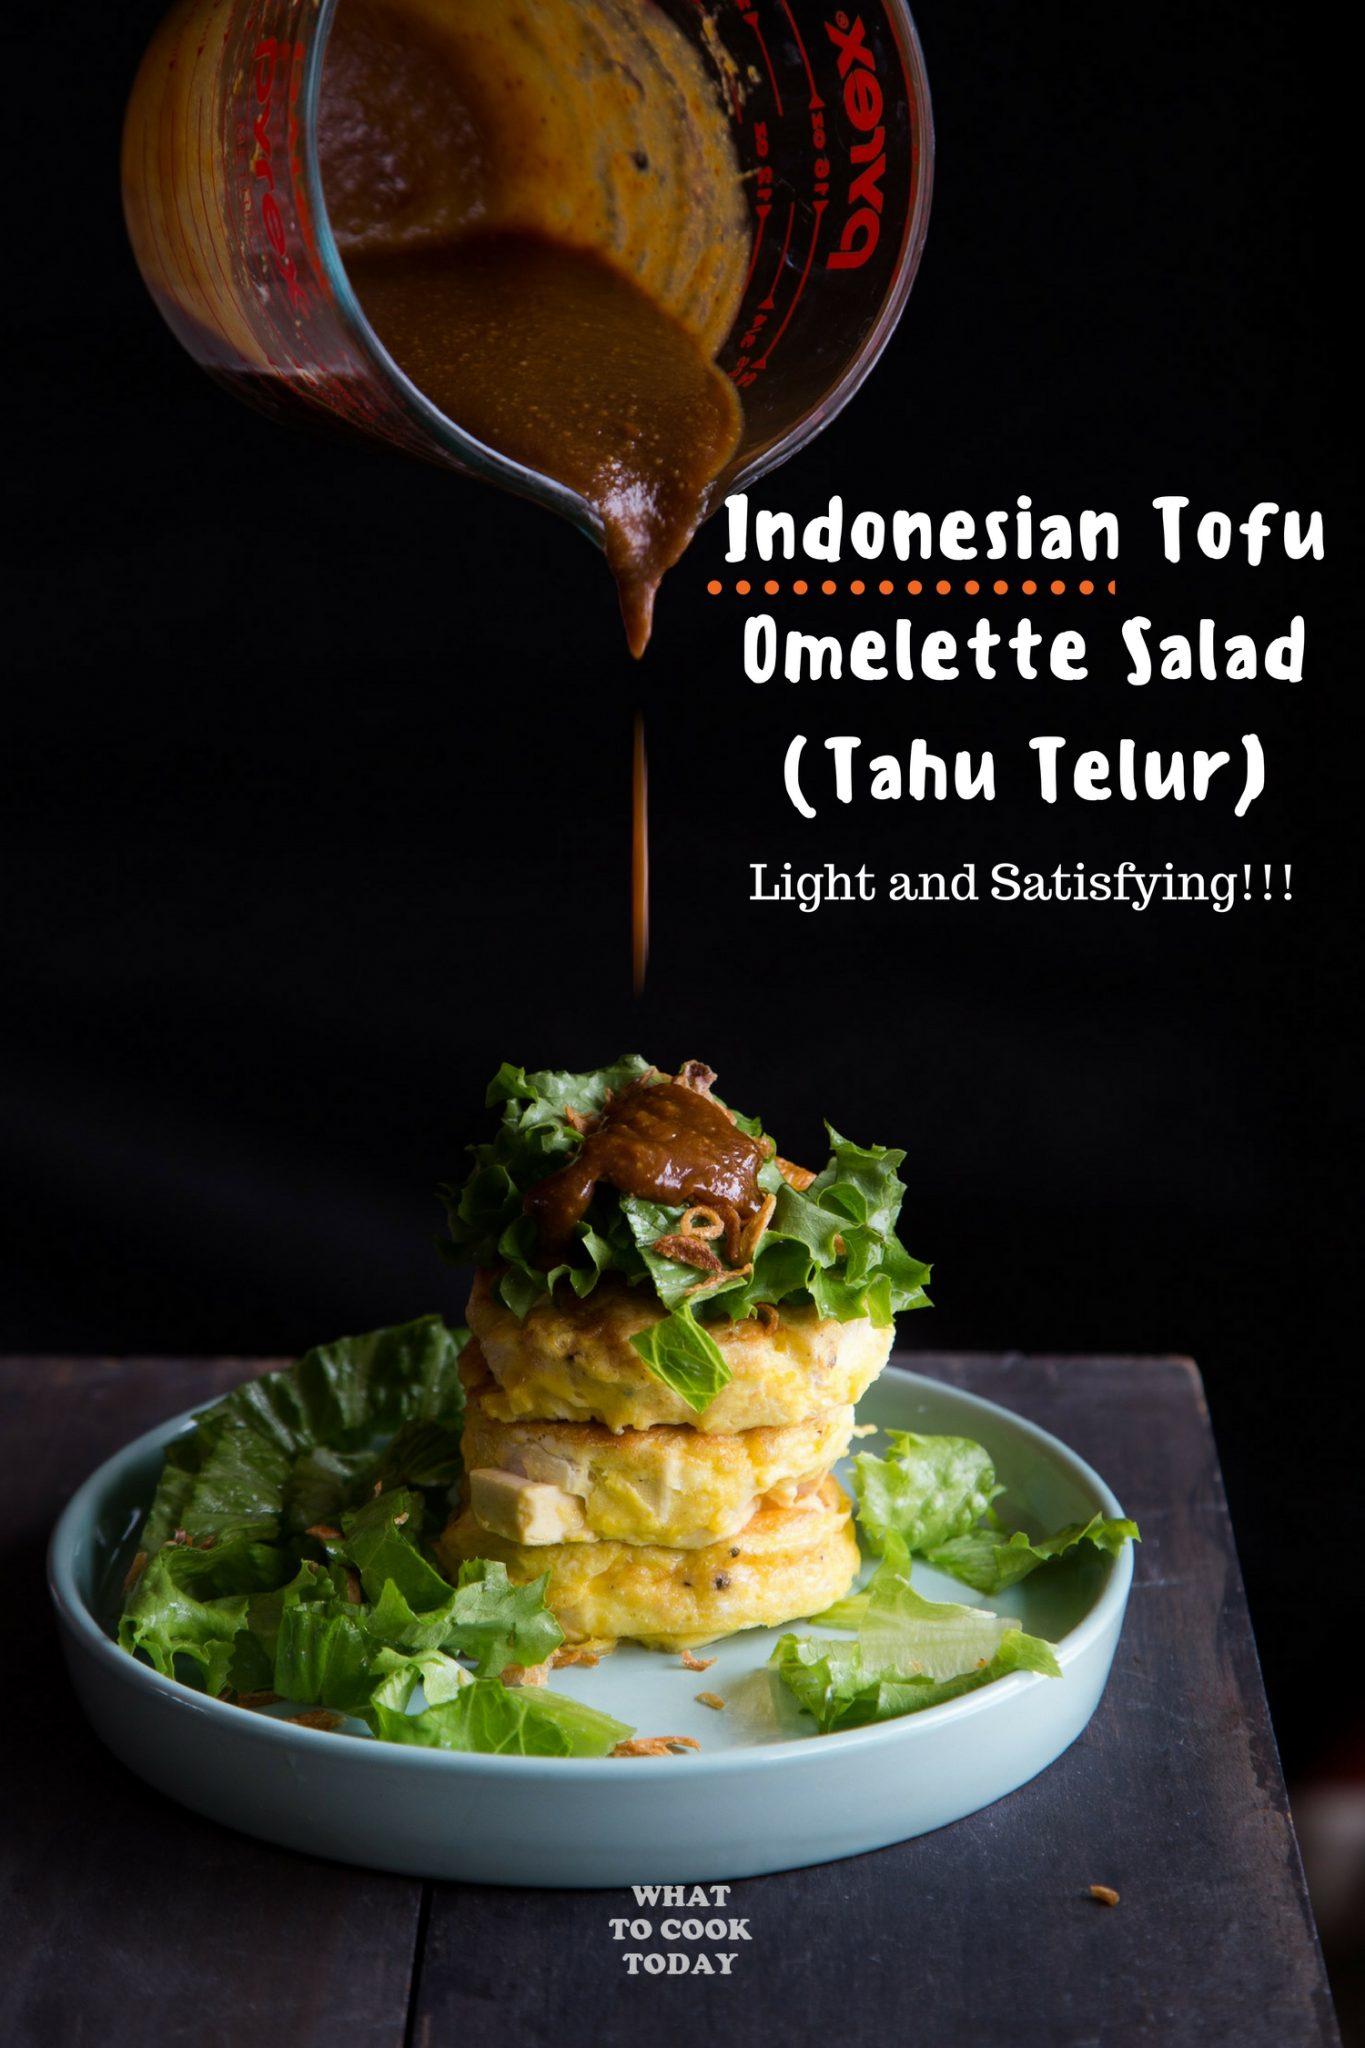 Tahu Telur (Indonesian Tofu Omelettes) #tofu #omelet #omelettes #eggs #easyrecipe #indonesianfood